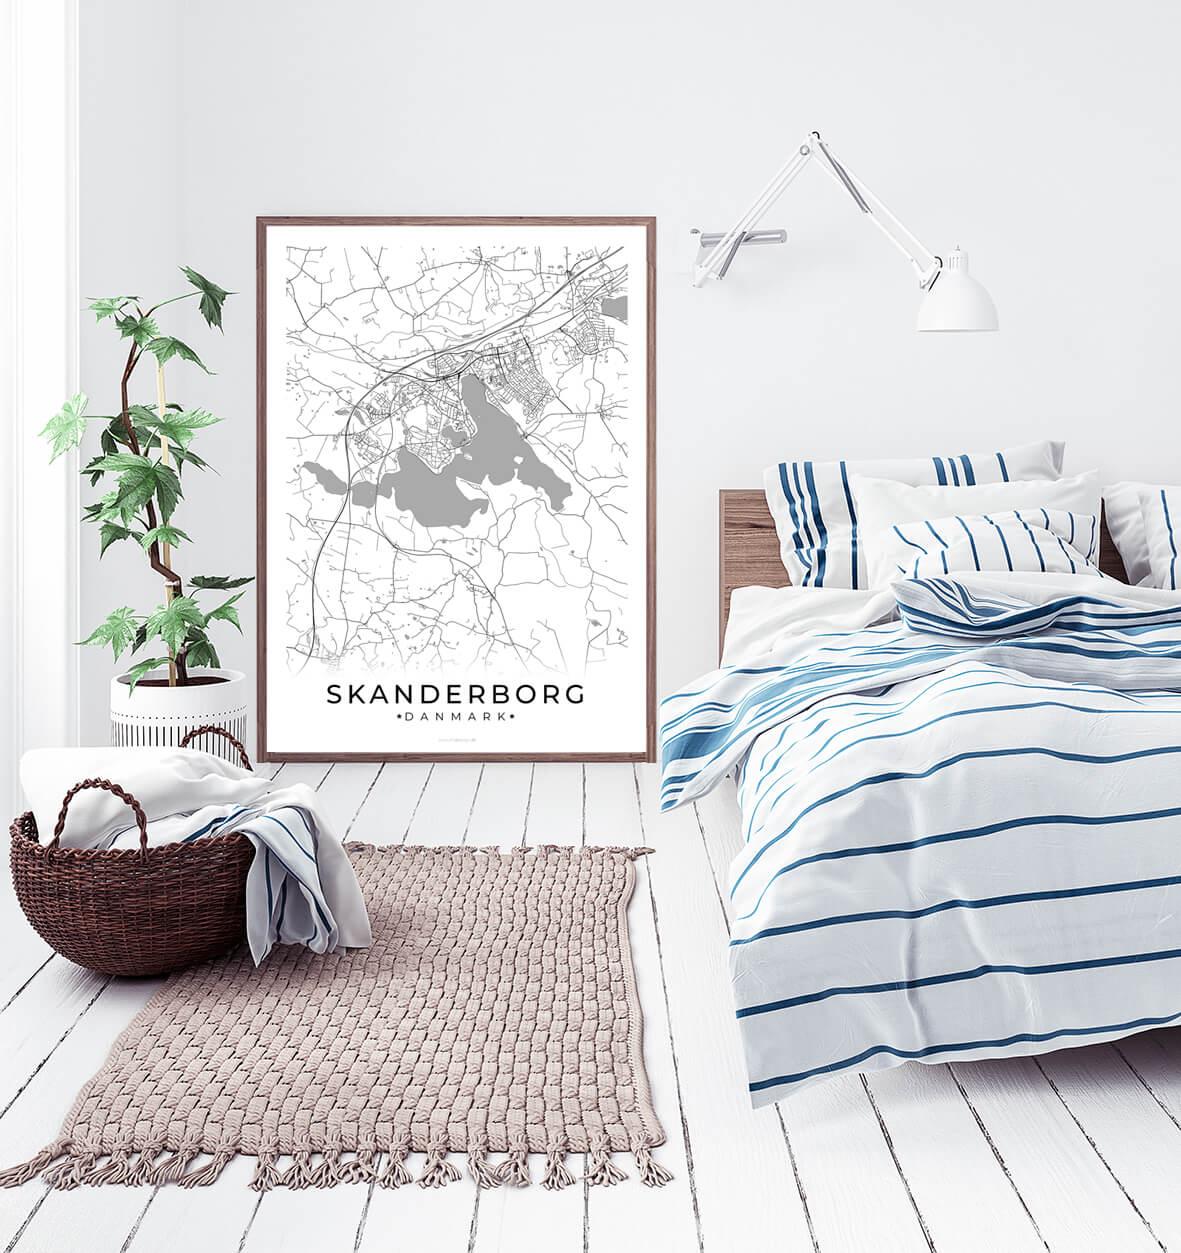 Skanderborg-hvid-byplakat-2